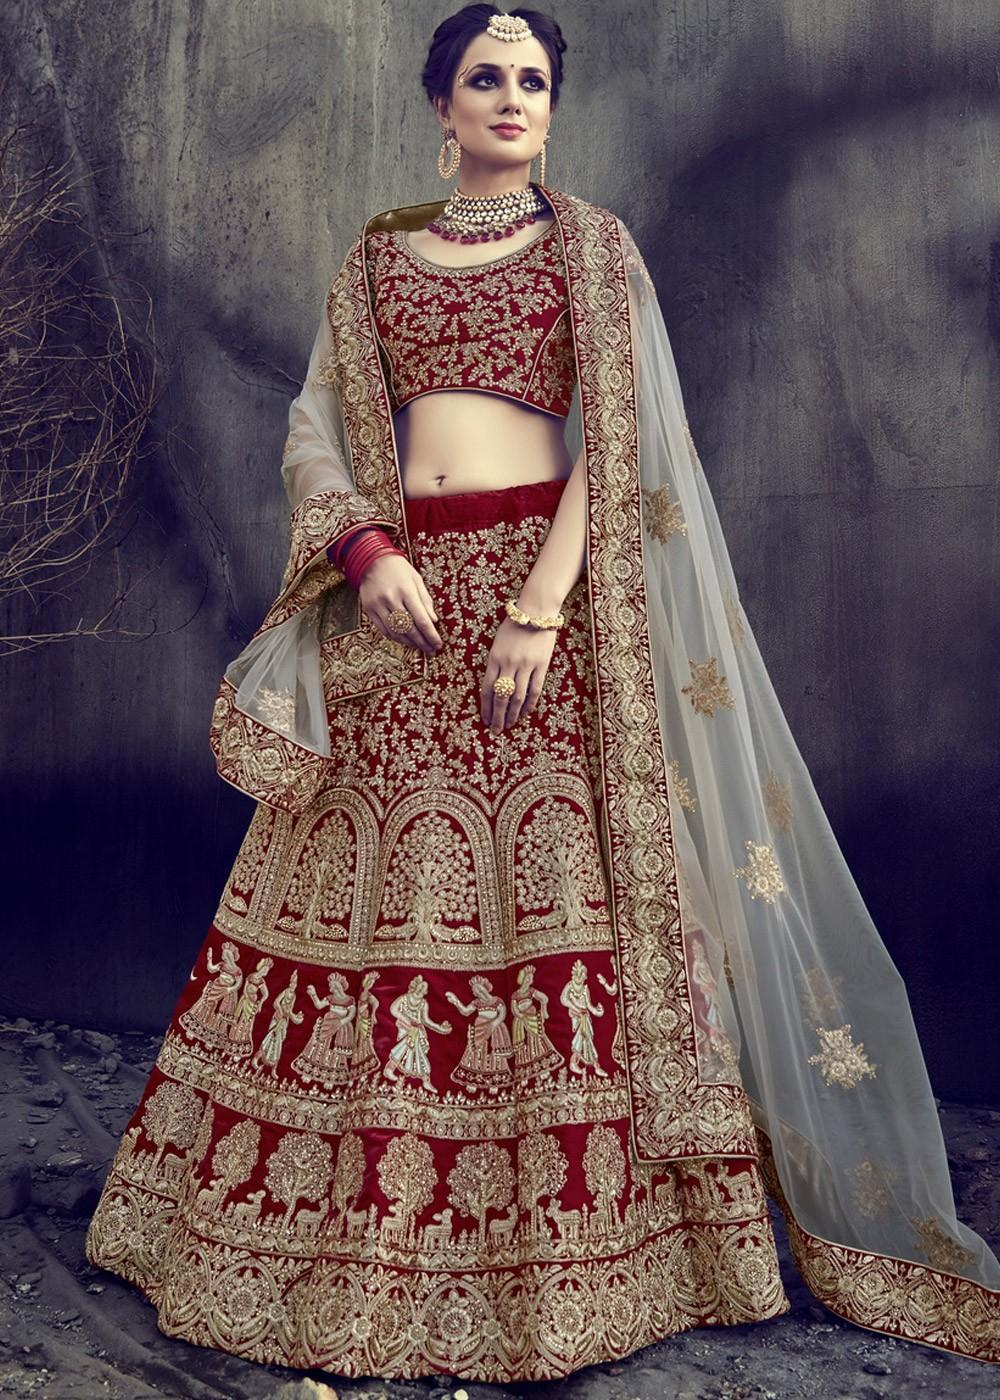 00be6e1242 Maroon Velvet Bridal Lehenga Choli with Dupatta Most Loved Styles ...